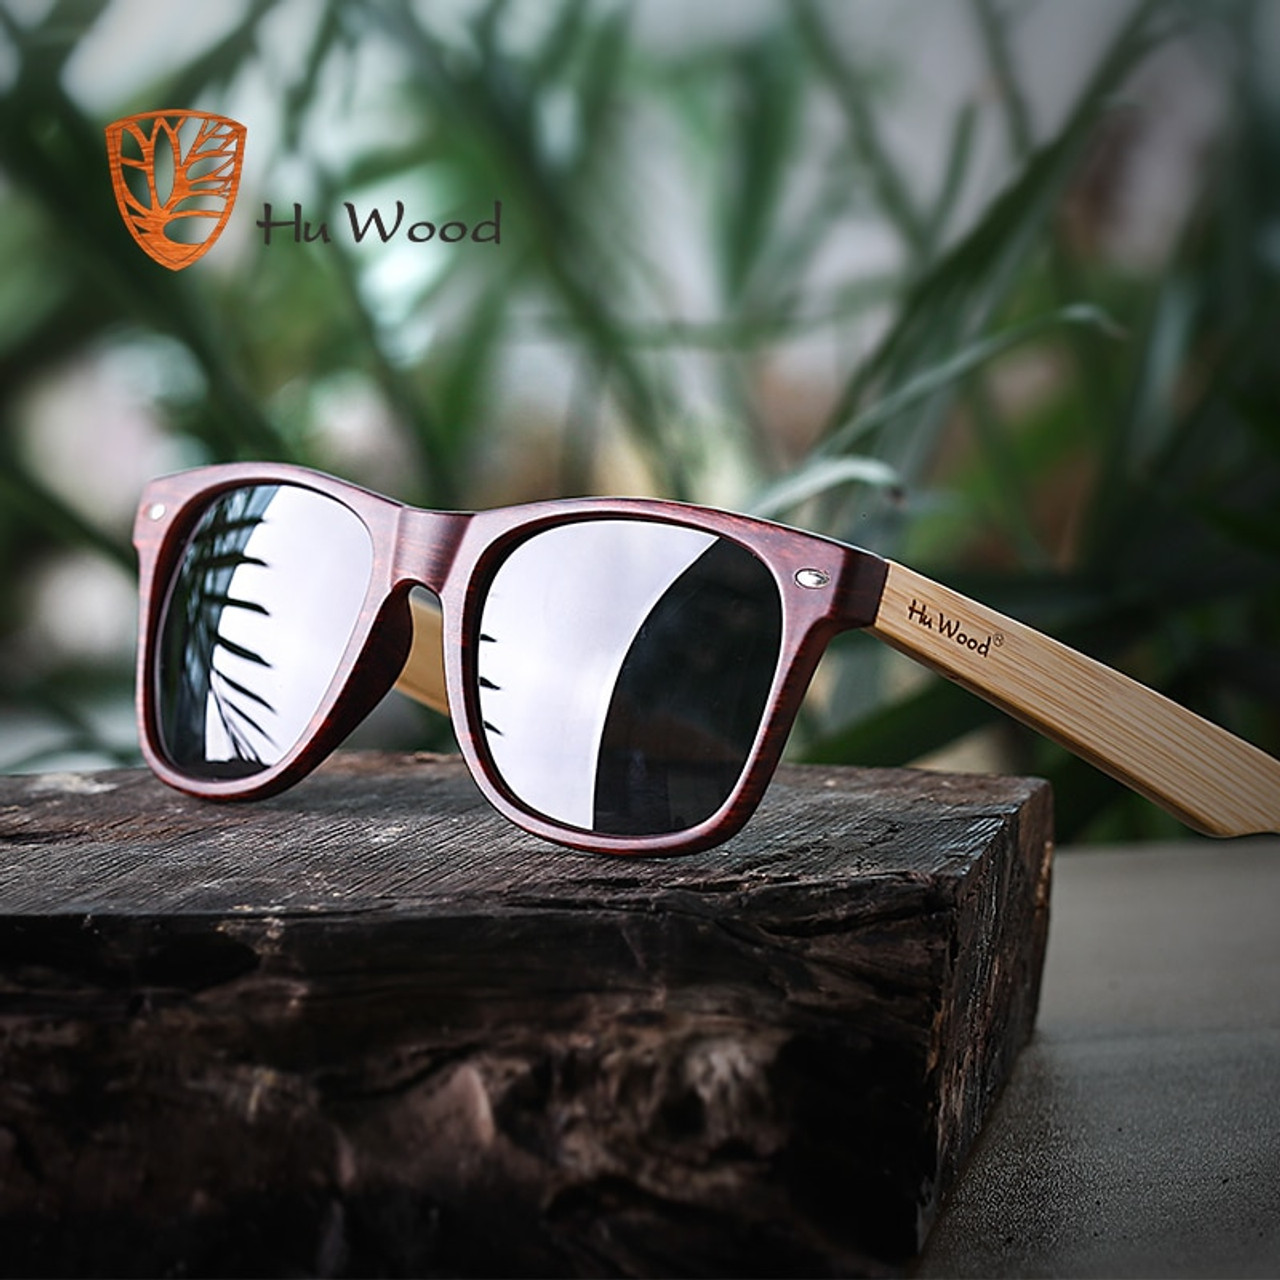 f7e150172b HU WOOD 2018 DESIGN Men Women Classic Retro Rivet Polarized Sunglasses 100%  UV Protection bamboo Sun Glasses GRS8004 - OnshopDeals.Com